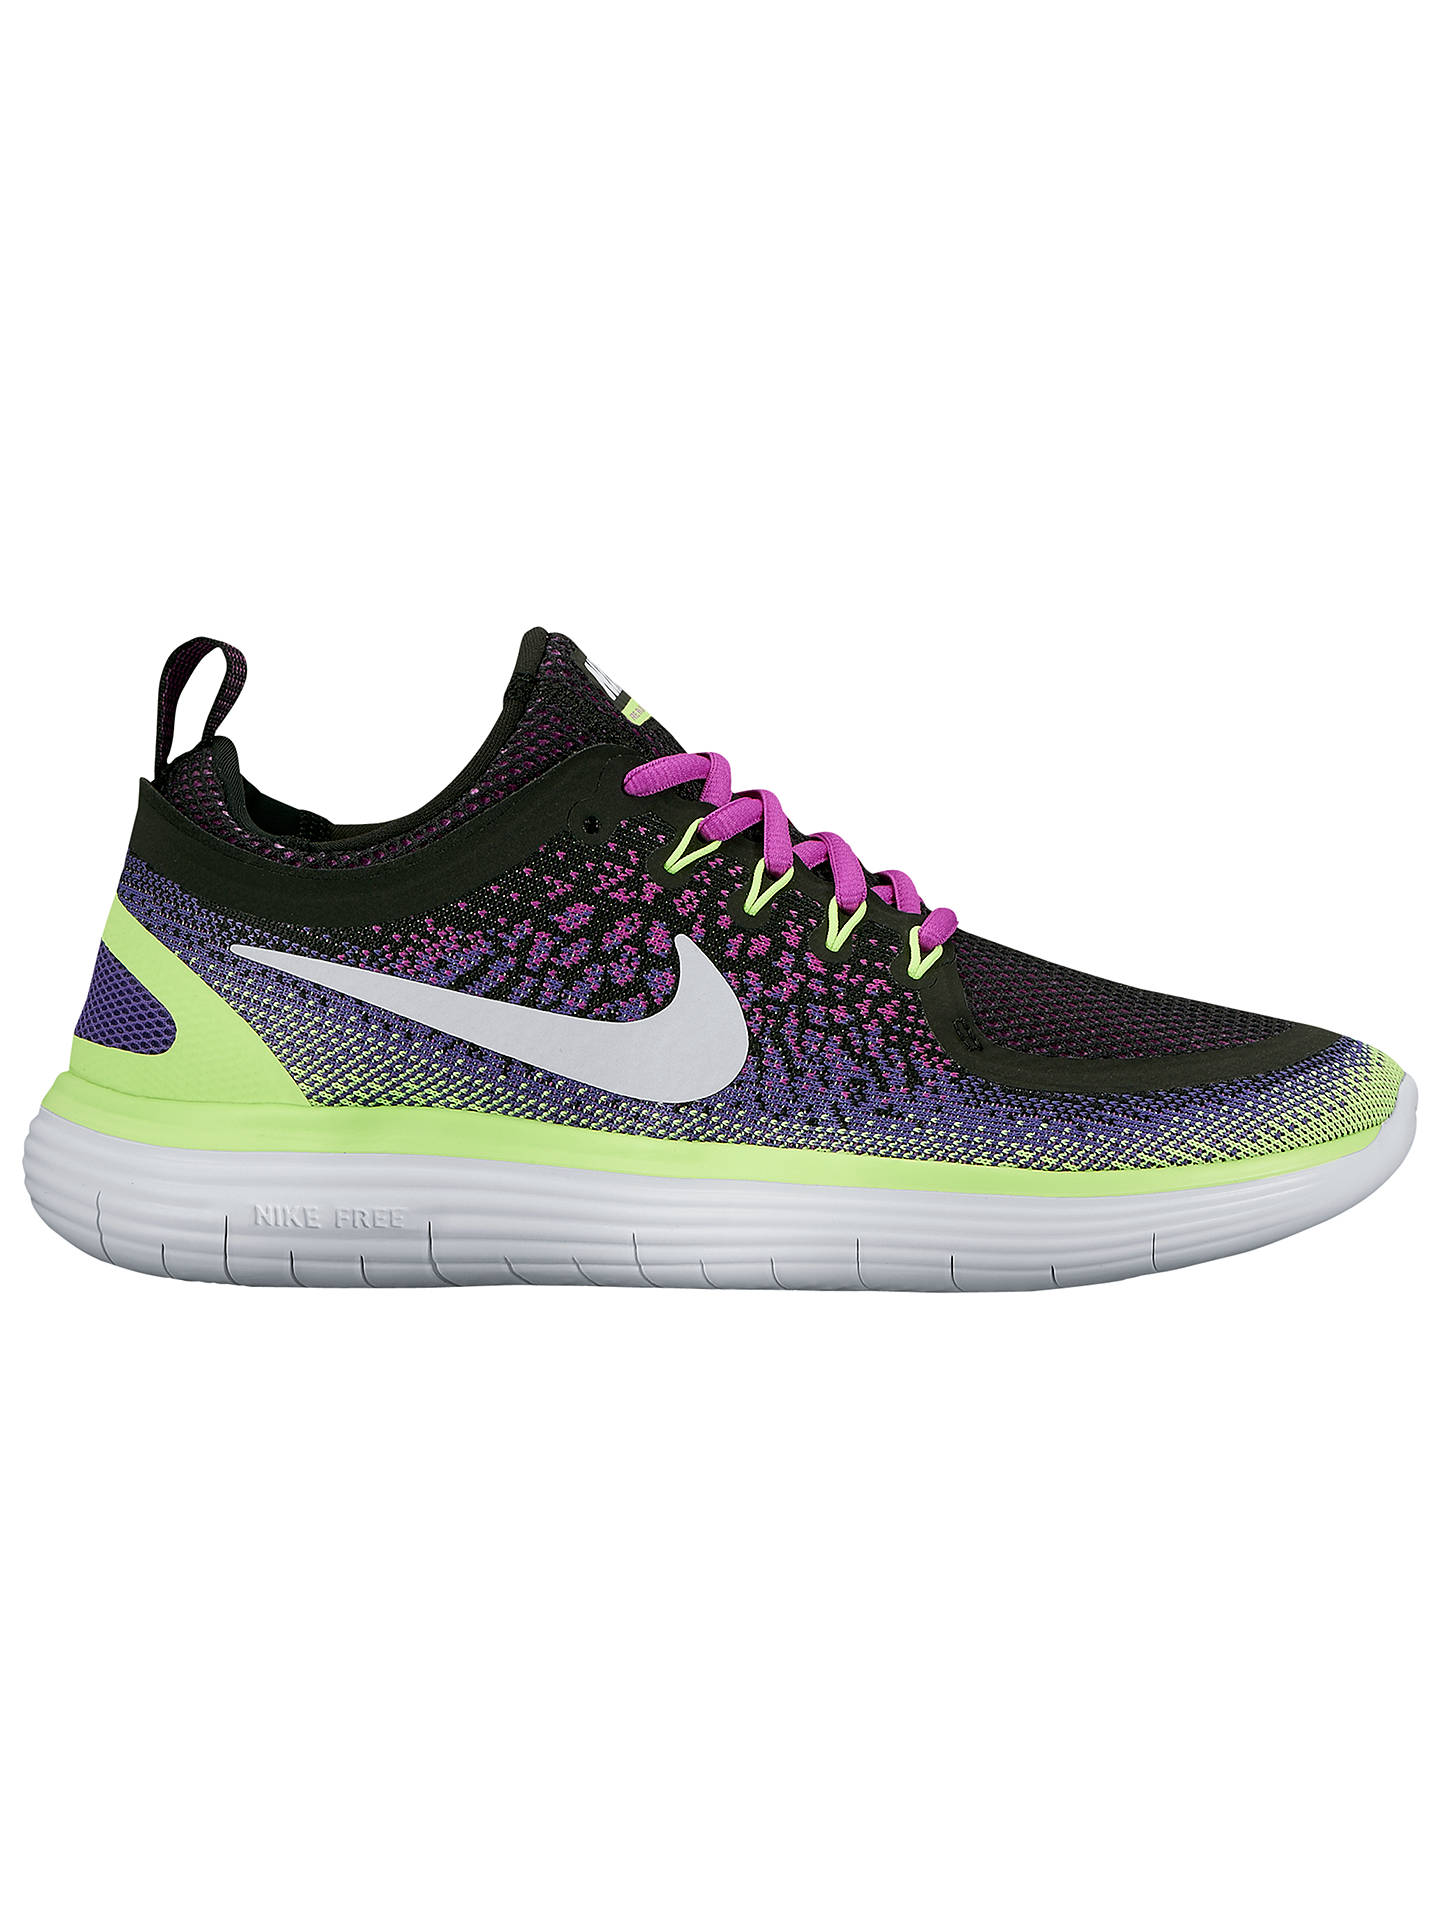 dcef8392826e Buy Nike Free RN Distance 2 Women s Running Shoes